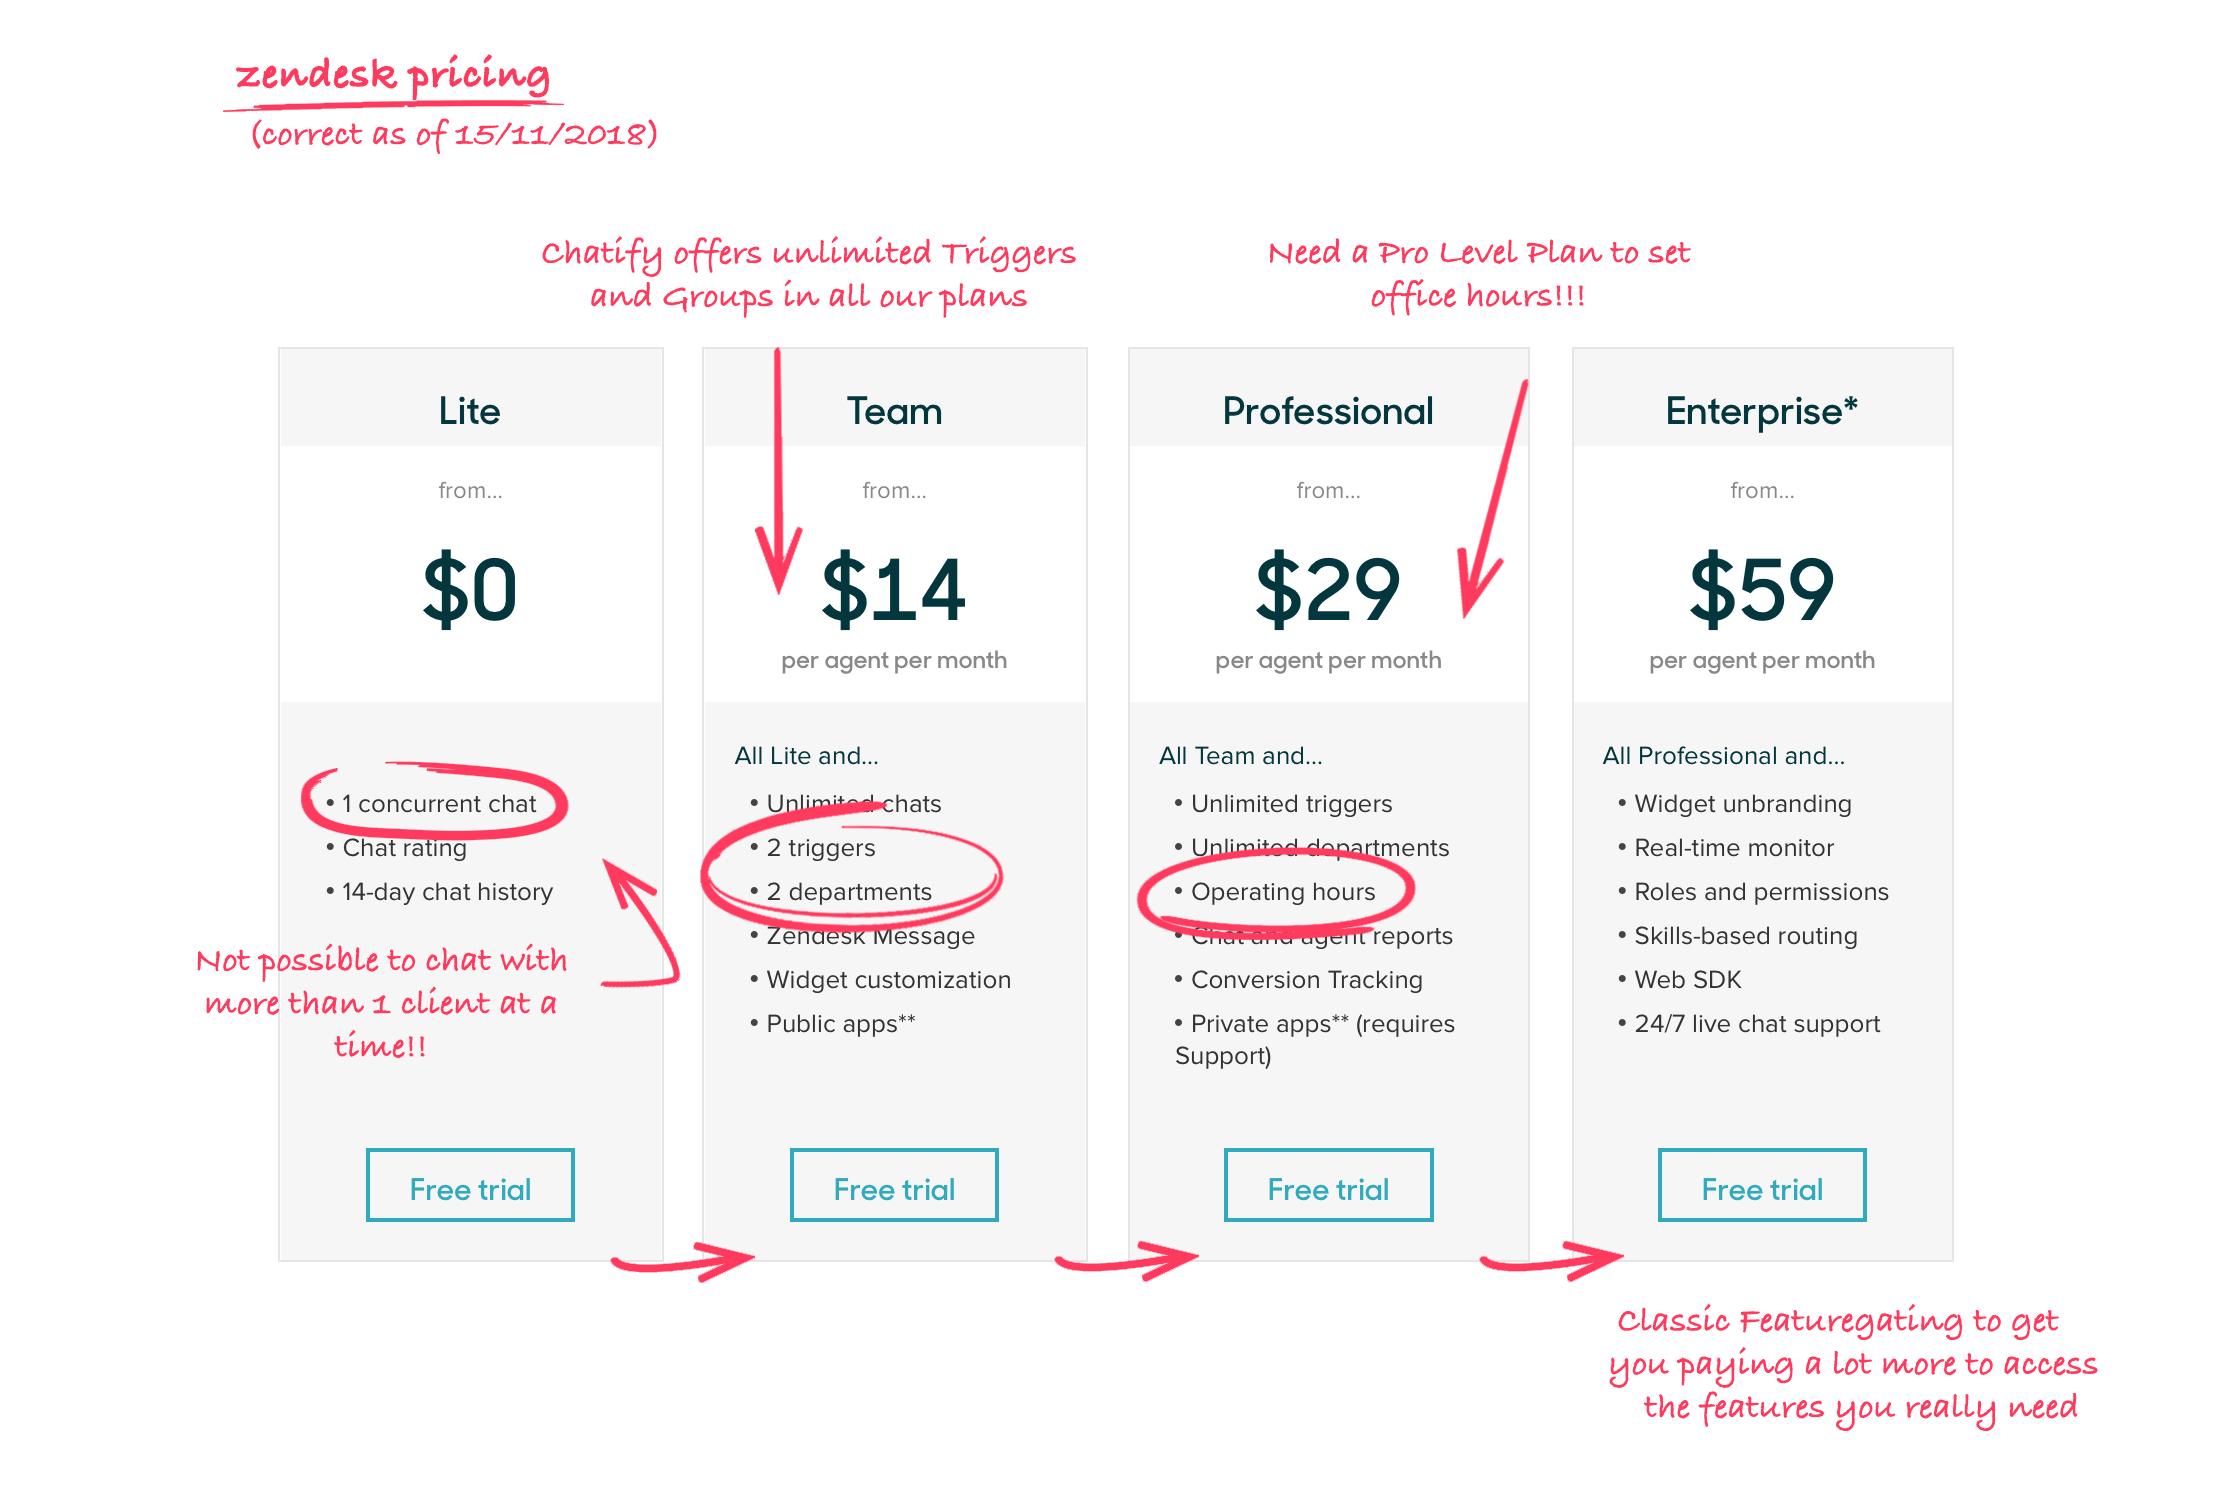 Chatify com - The Zendesk Alternative